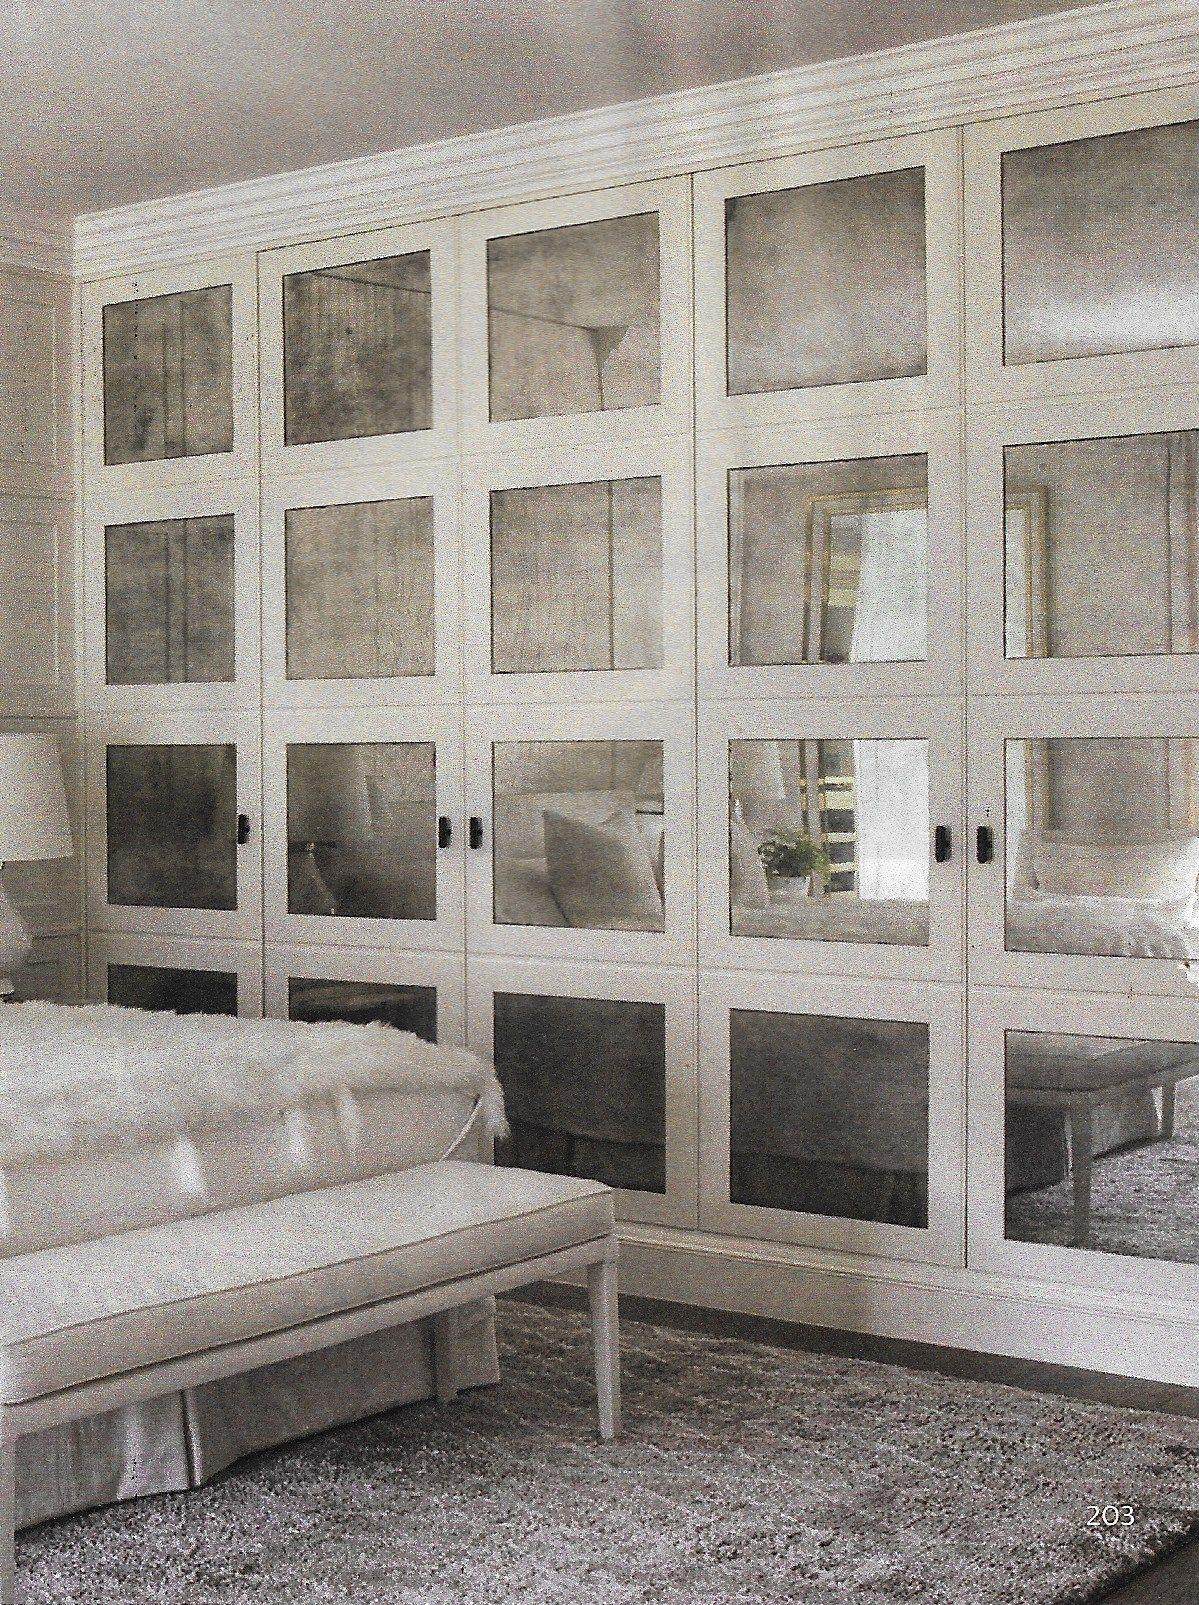 Antiqued Mirrored Closet Doors Though Make 1 Or 2 Panels Vs 4 Shown Here Mirror Closet Doors Mirrored Wardrobe Doors Closet Doors